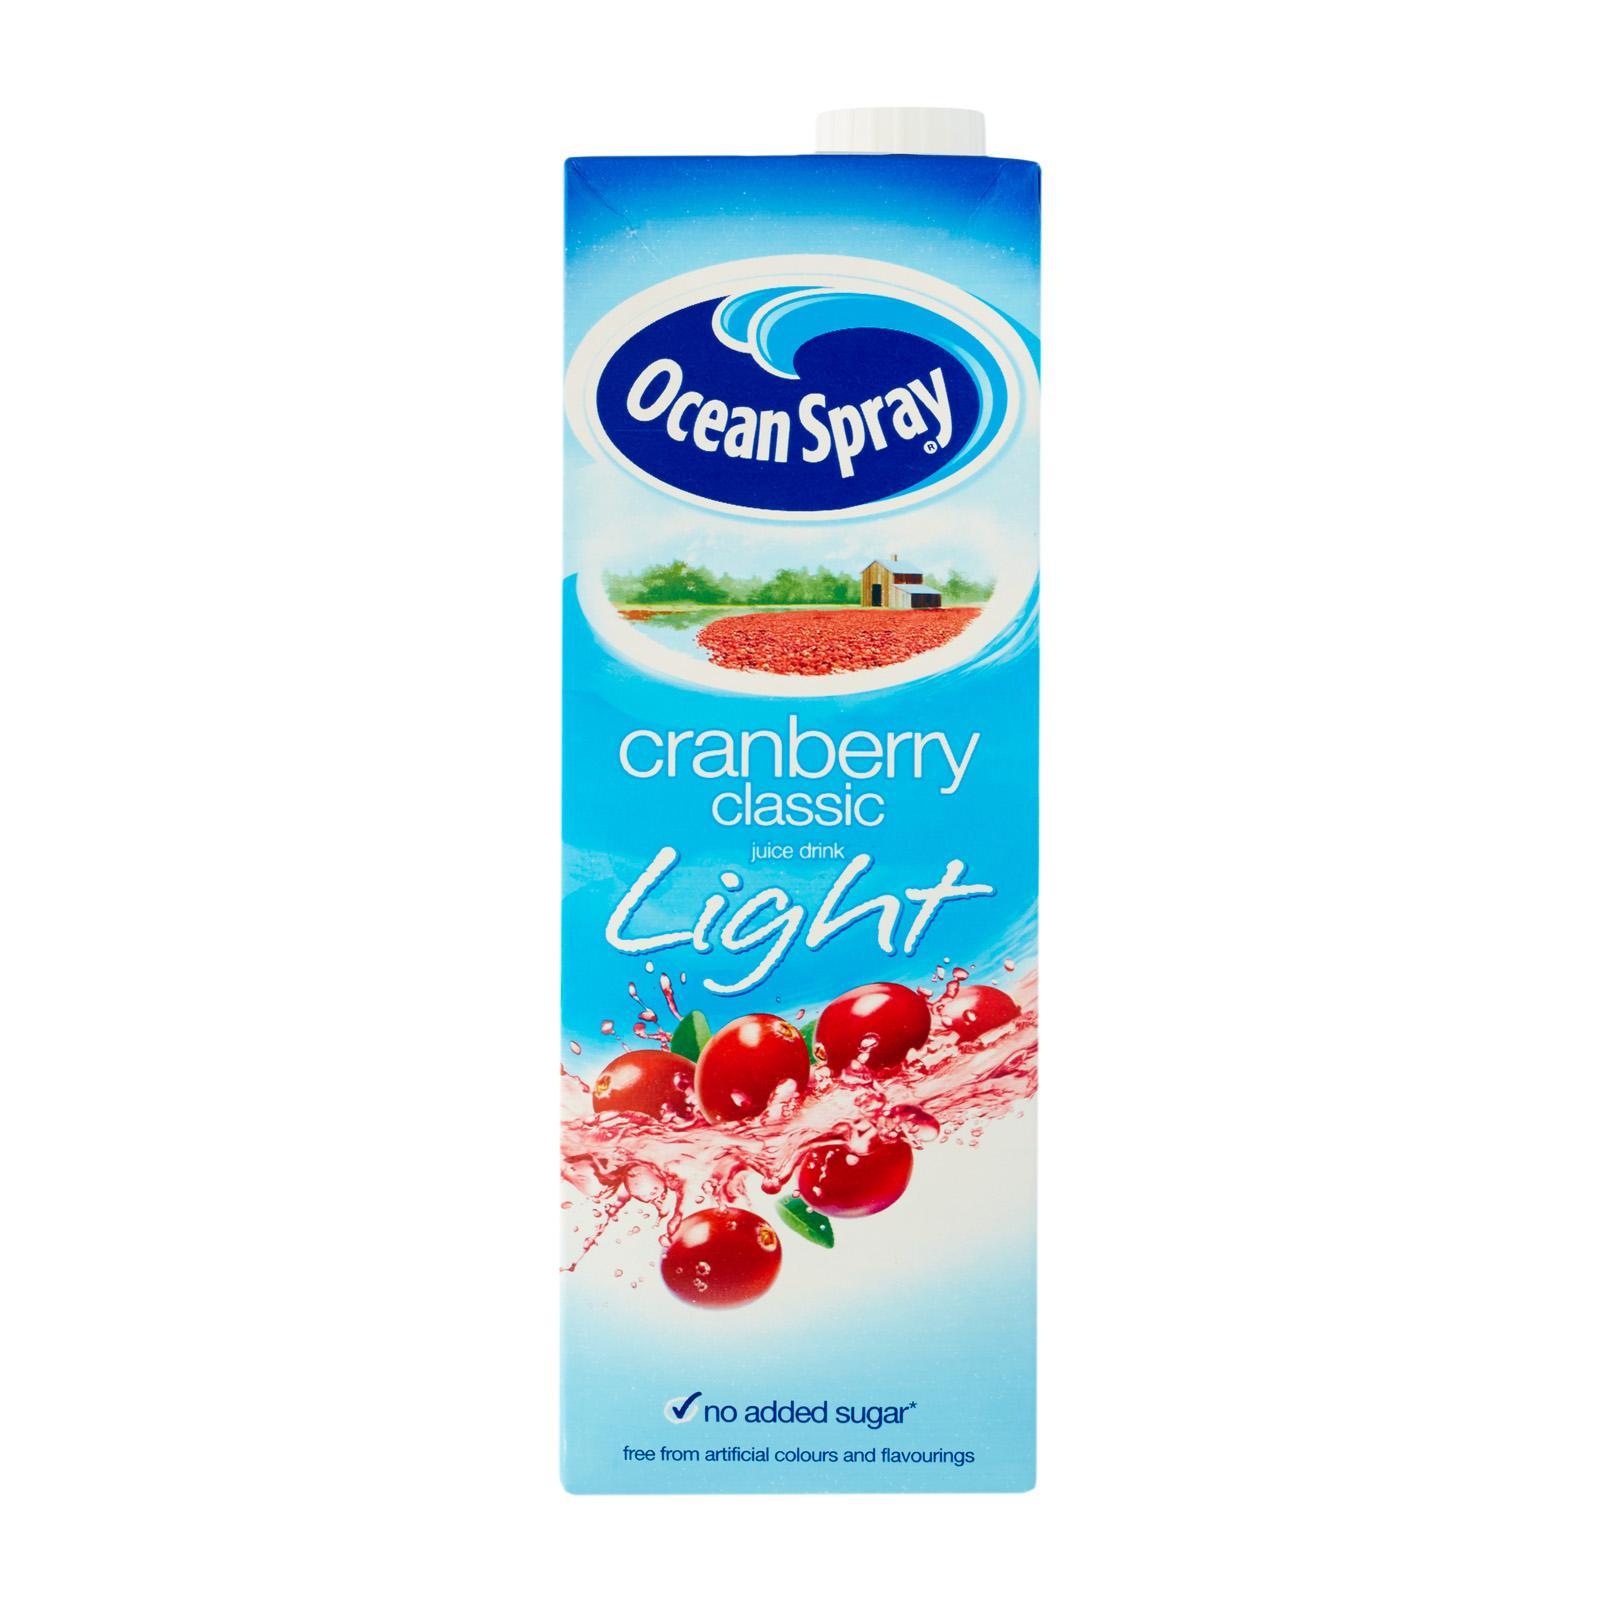 Ocean Spray Cranberry Classic Light Juice Drink